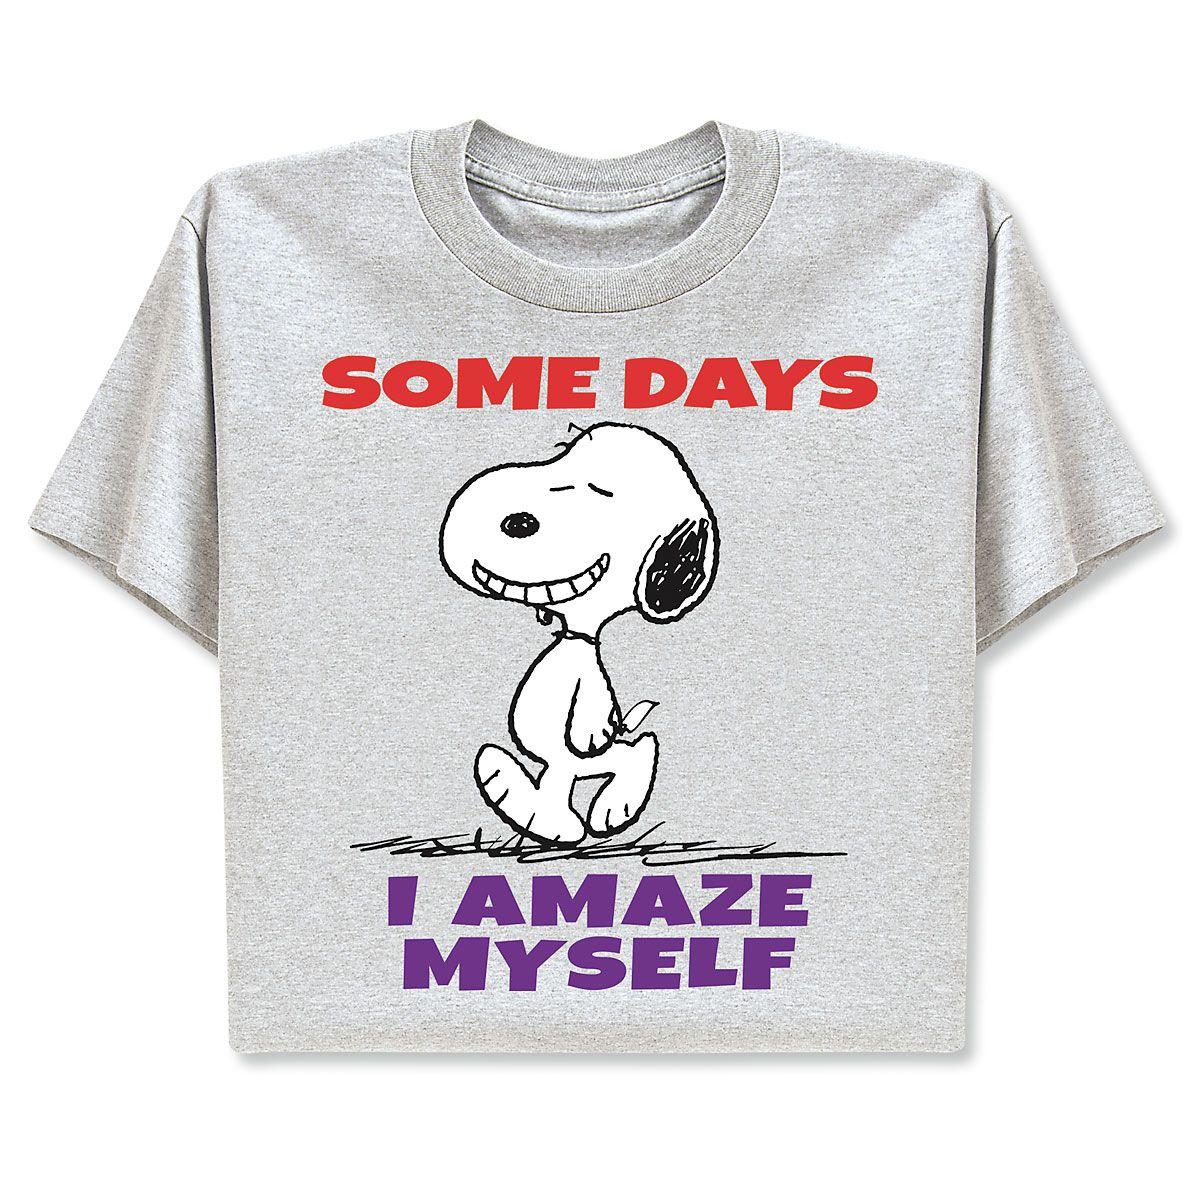 PEANUTS® T-Shirts - I Amaze Myself - Large